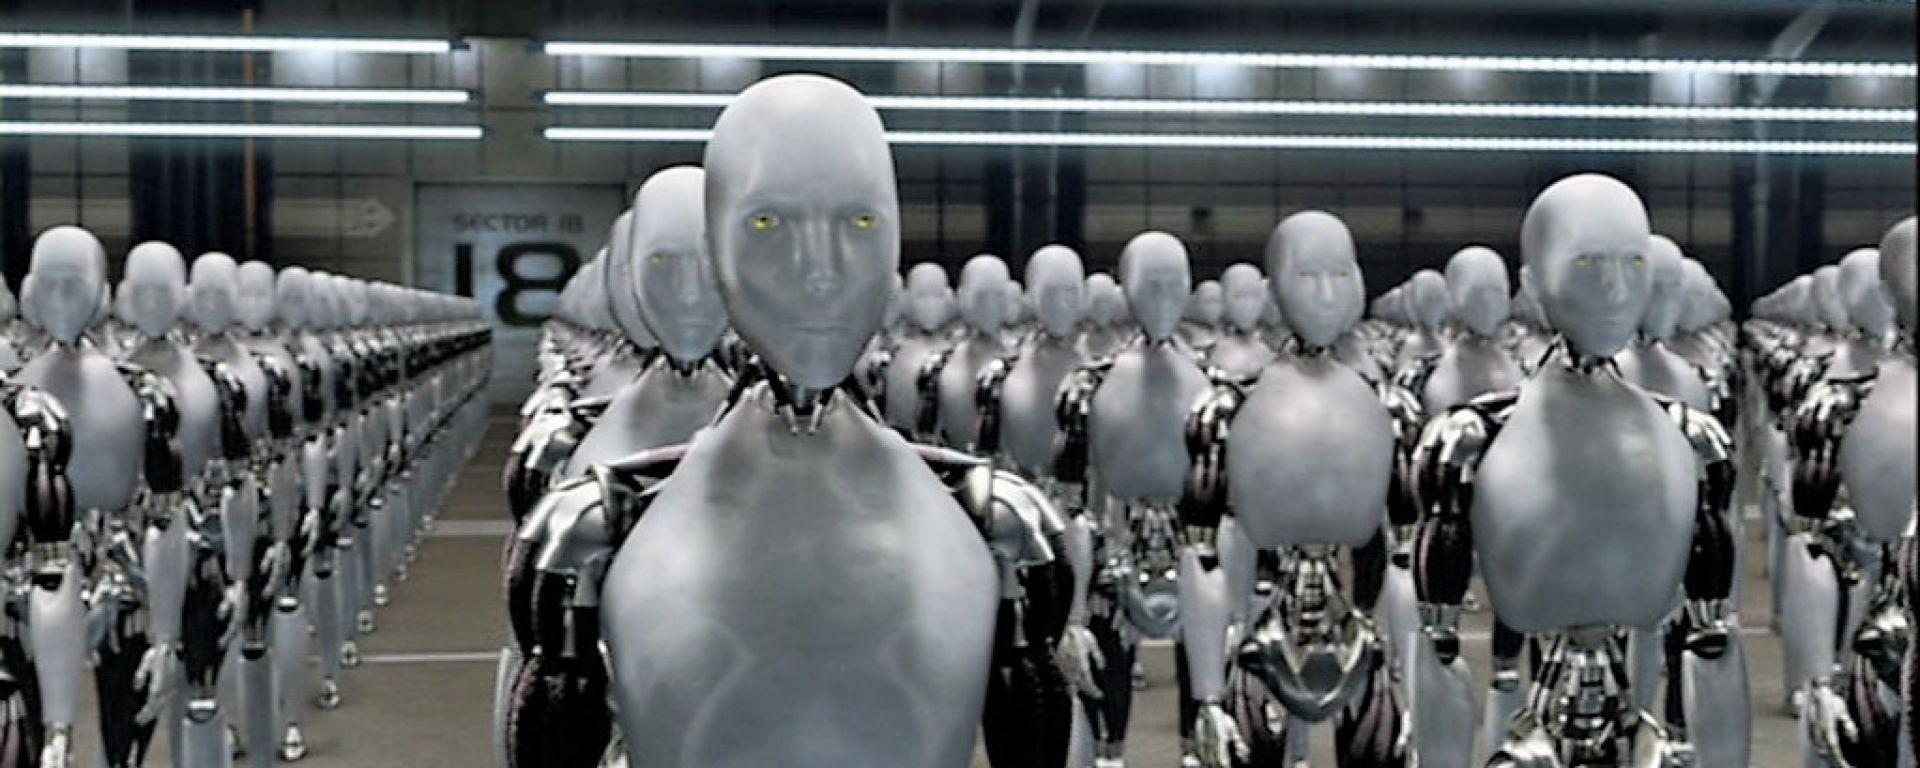 FIAT: novità esoscheletro. Io, Robot a Melfi?